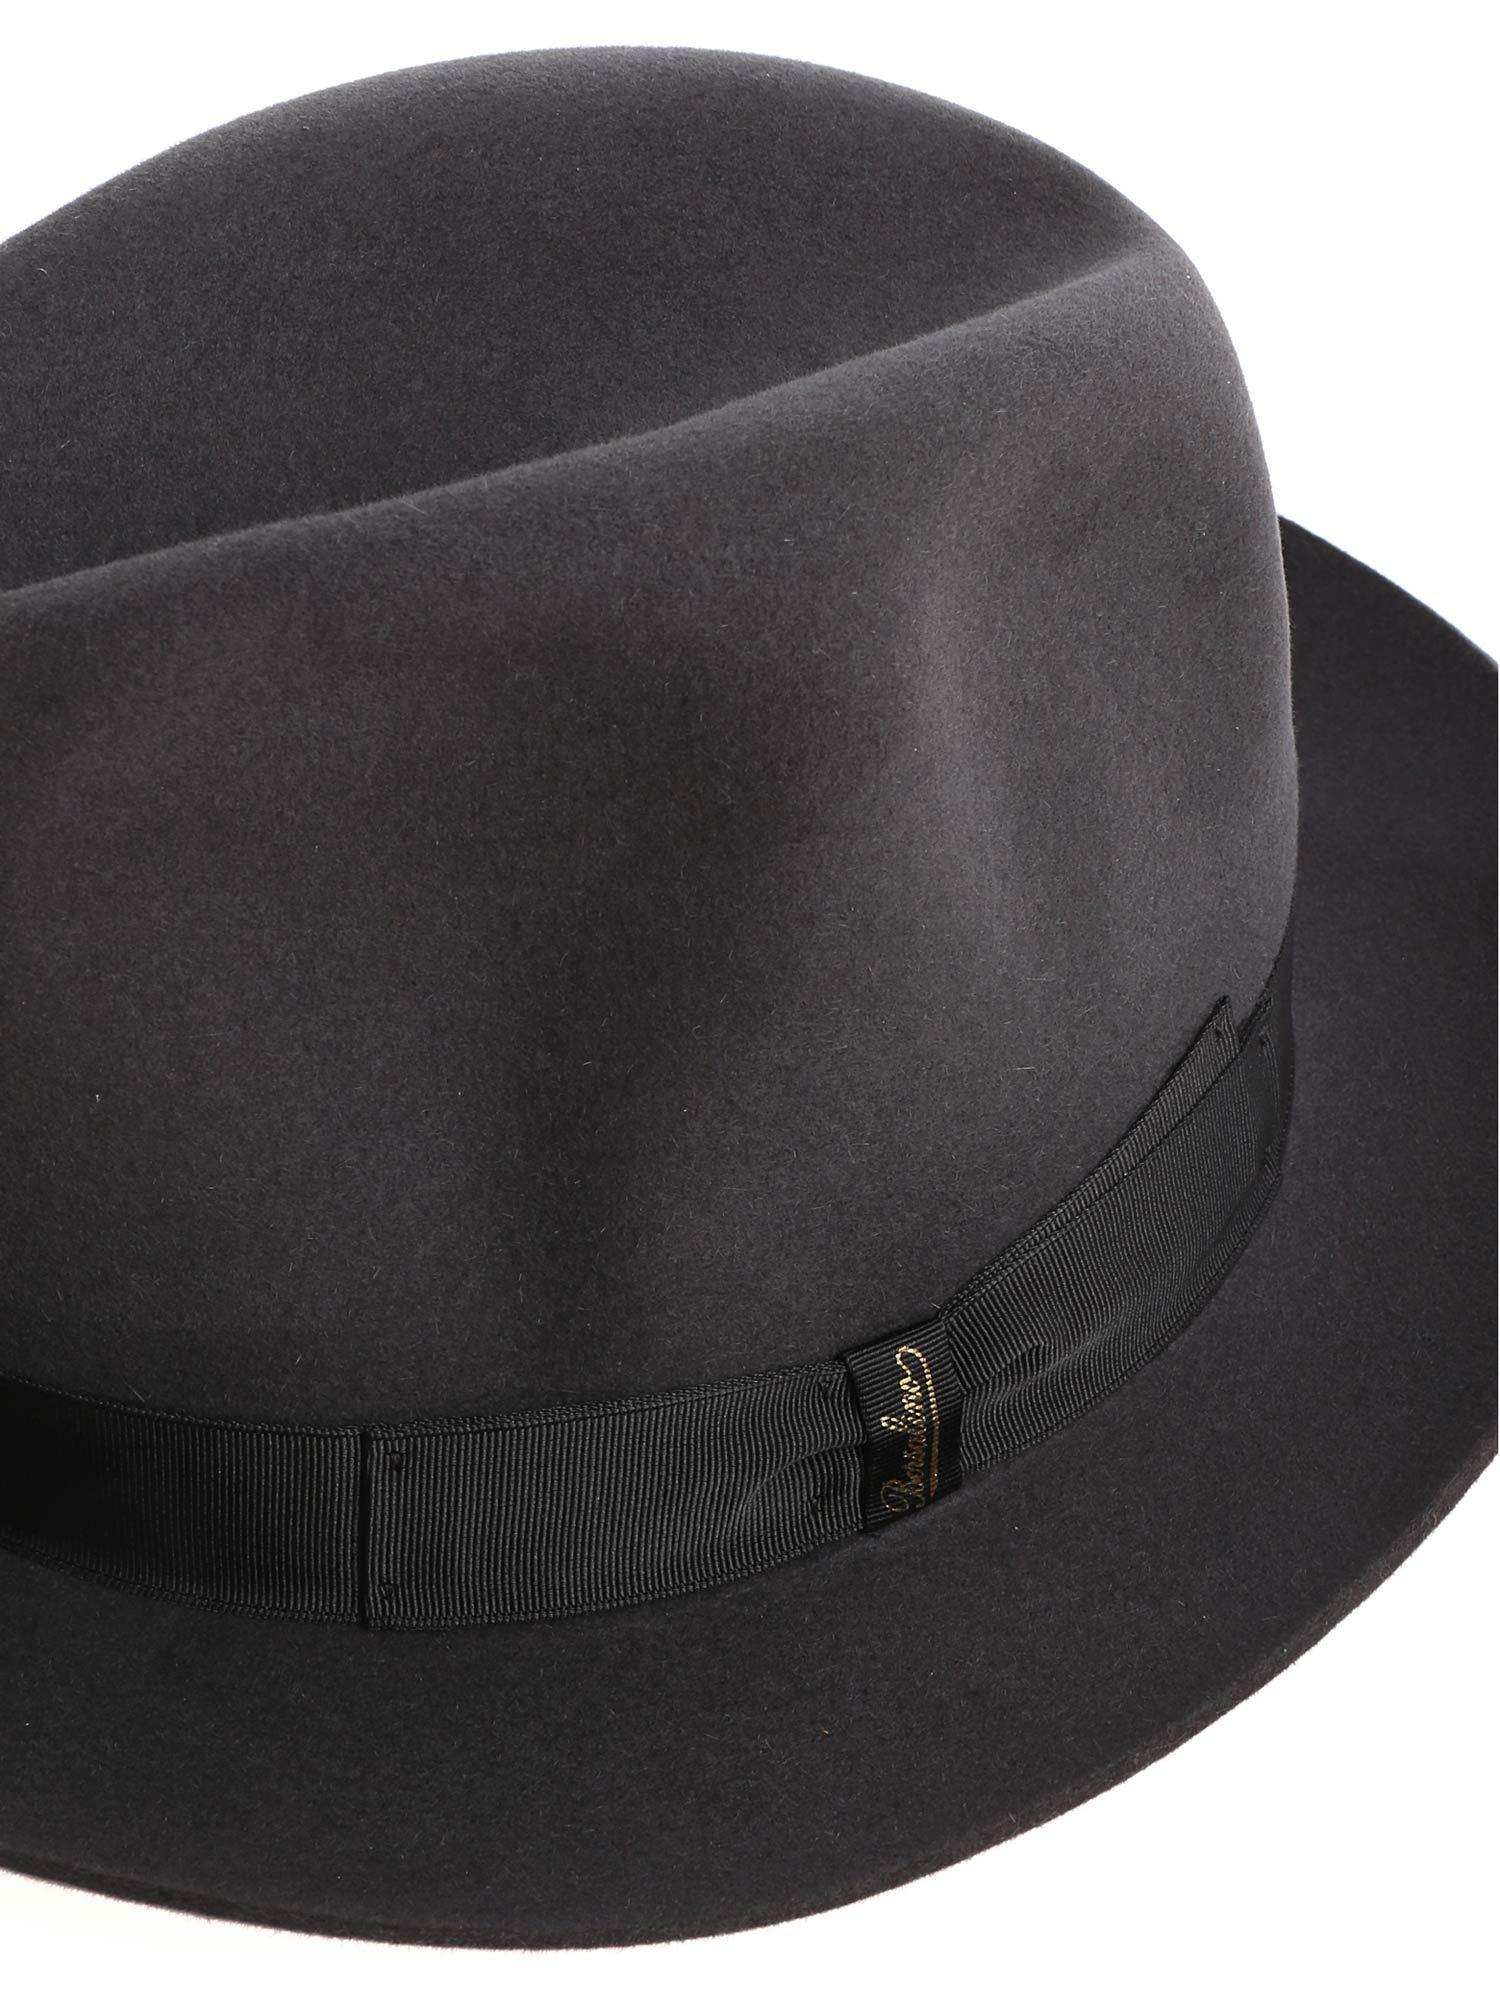 73753229b174f6 Borsalino - Dark Green Felt Marengo Hat for Men - Lyst. View fullscreen